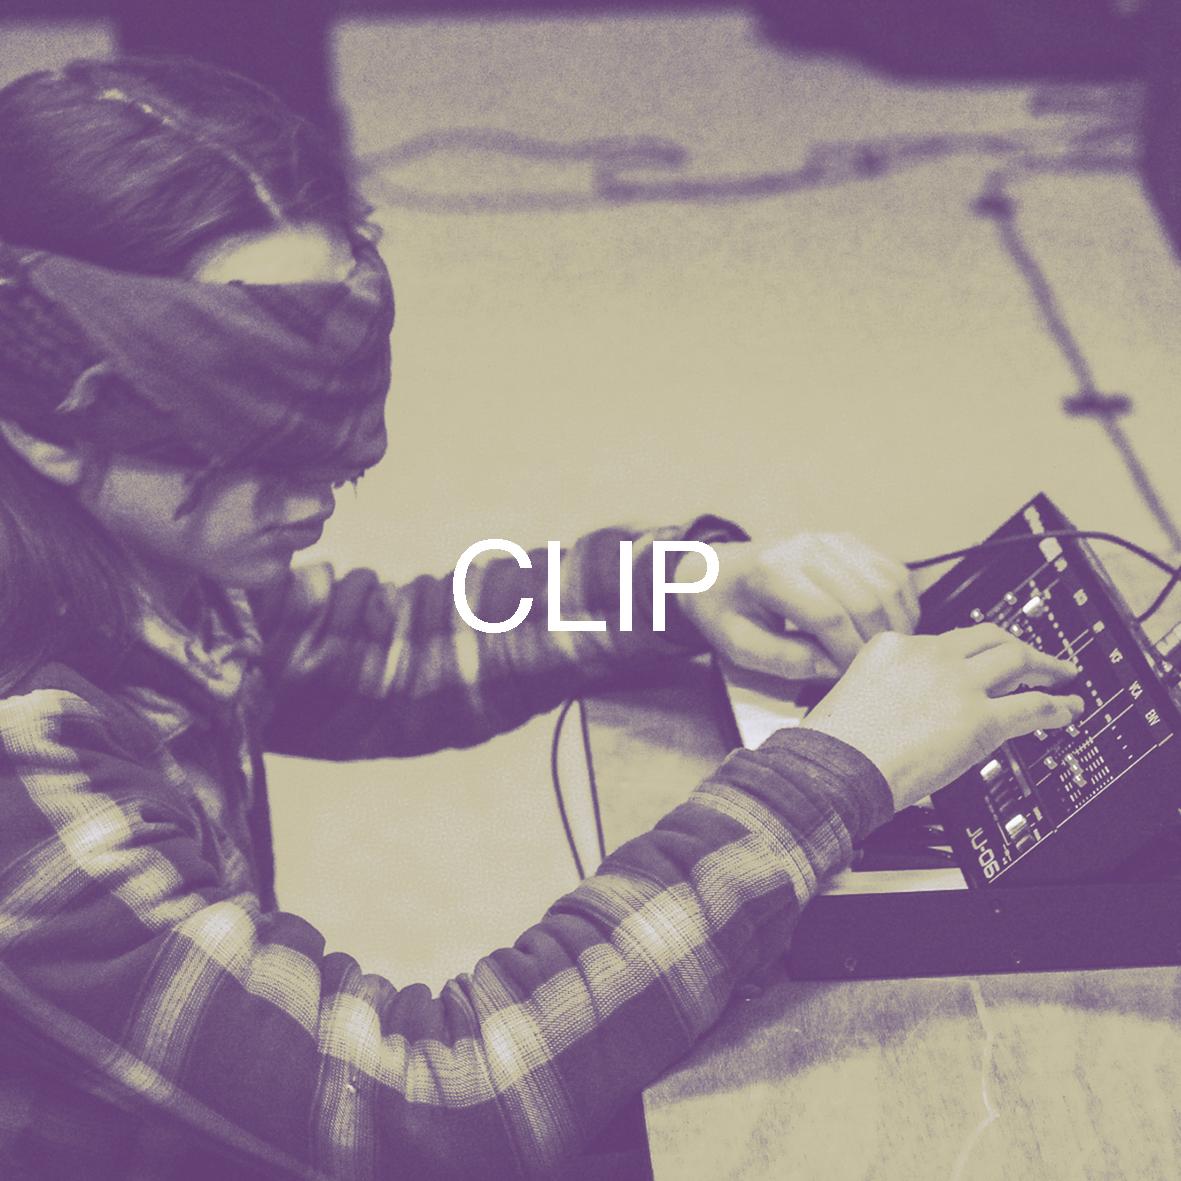 CLIPFIN.jpg